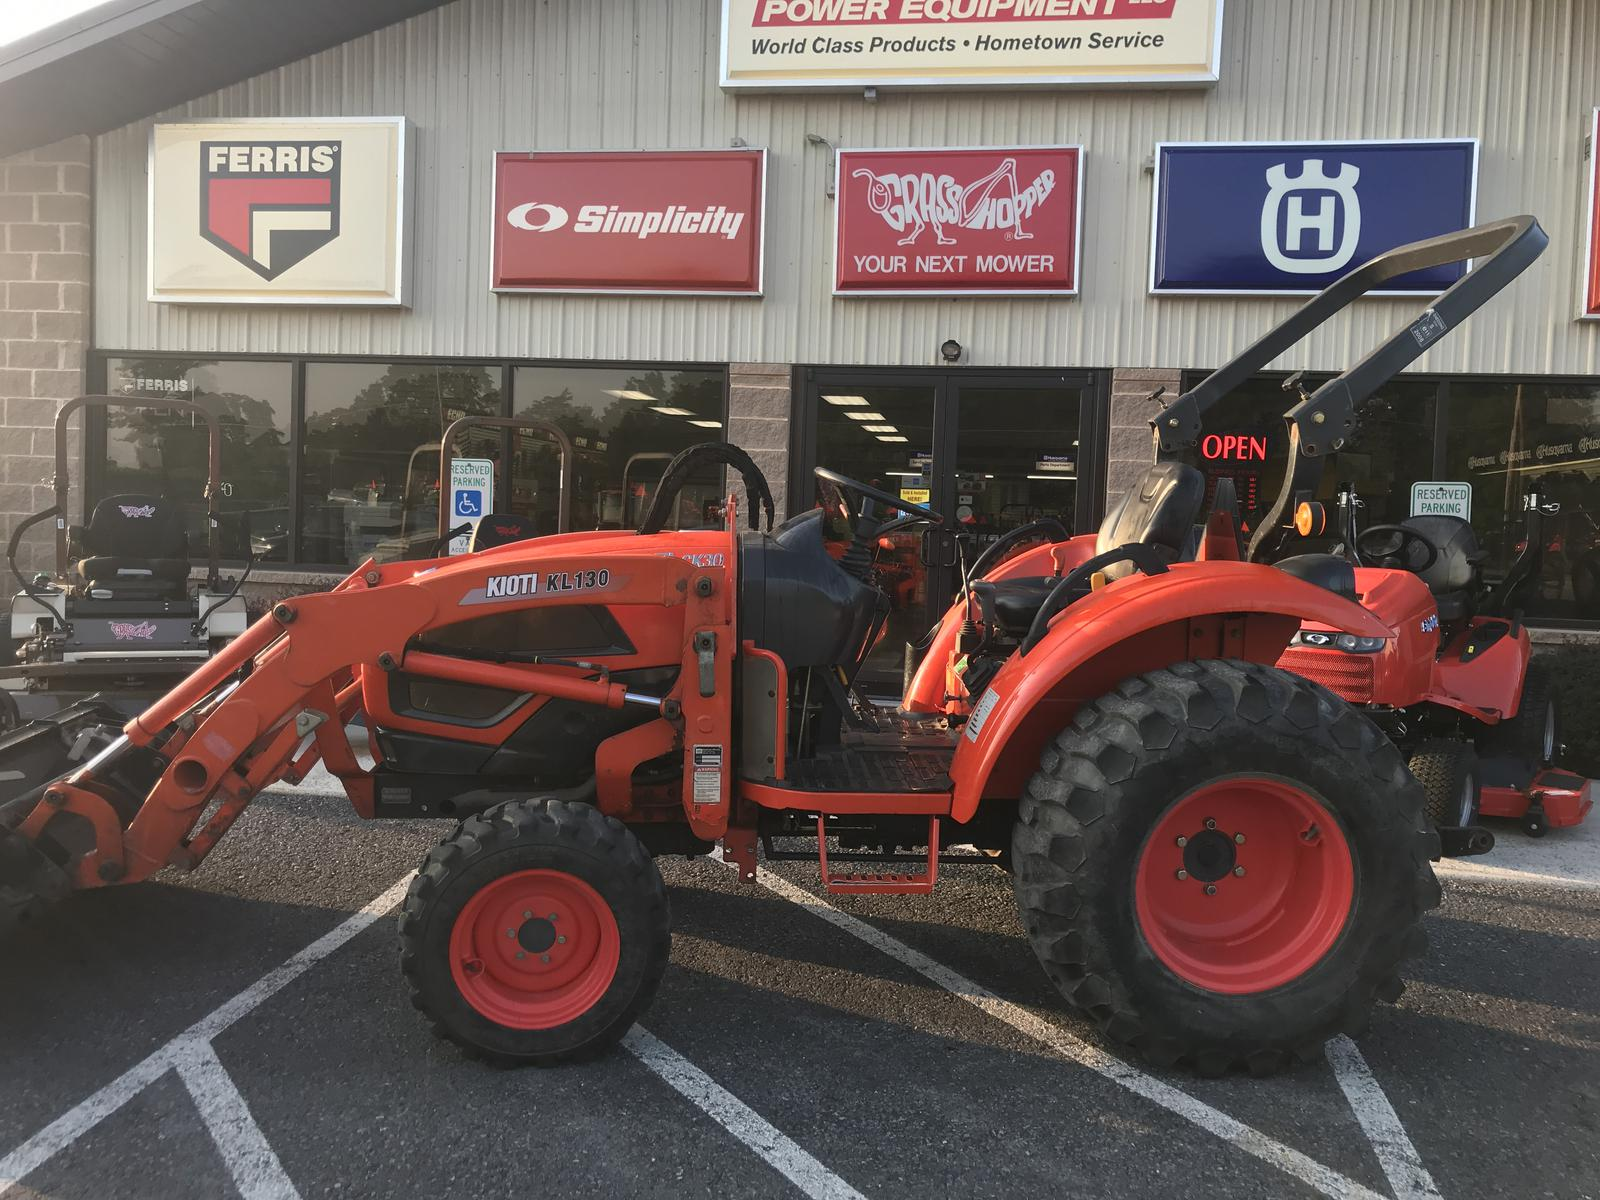 2010 KIOTI CK30 Compact Tractor